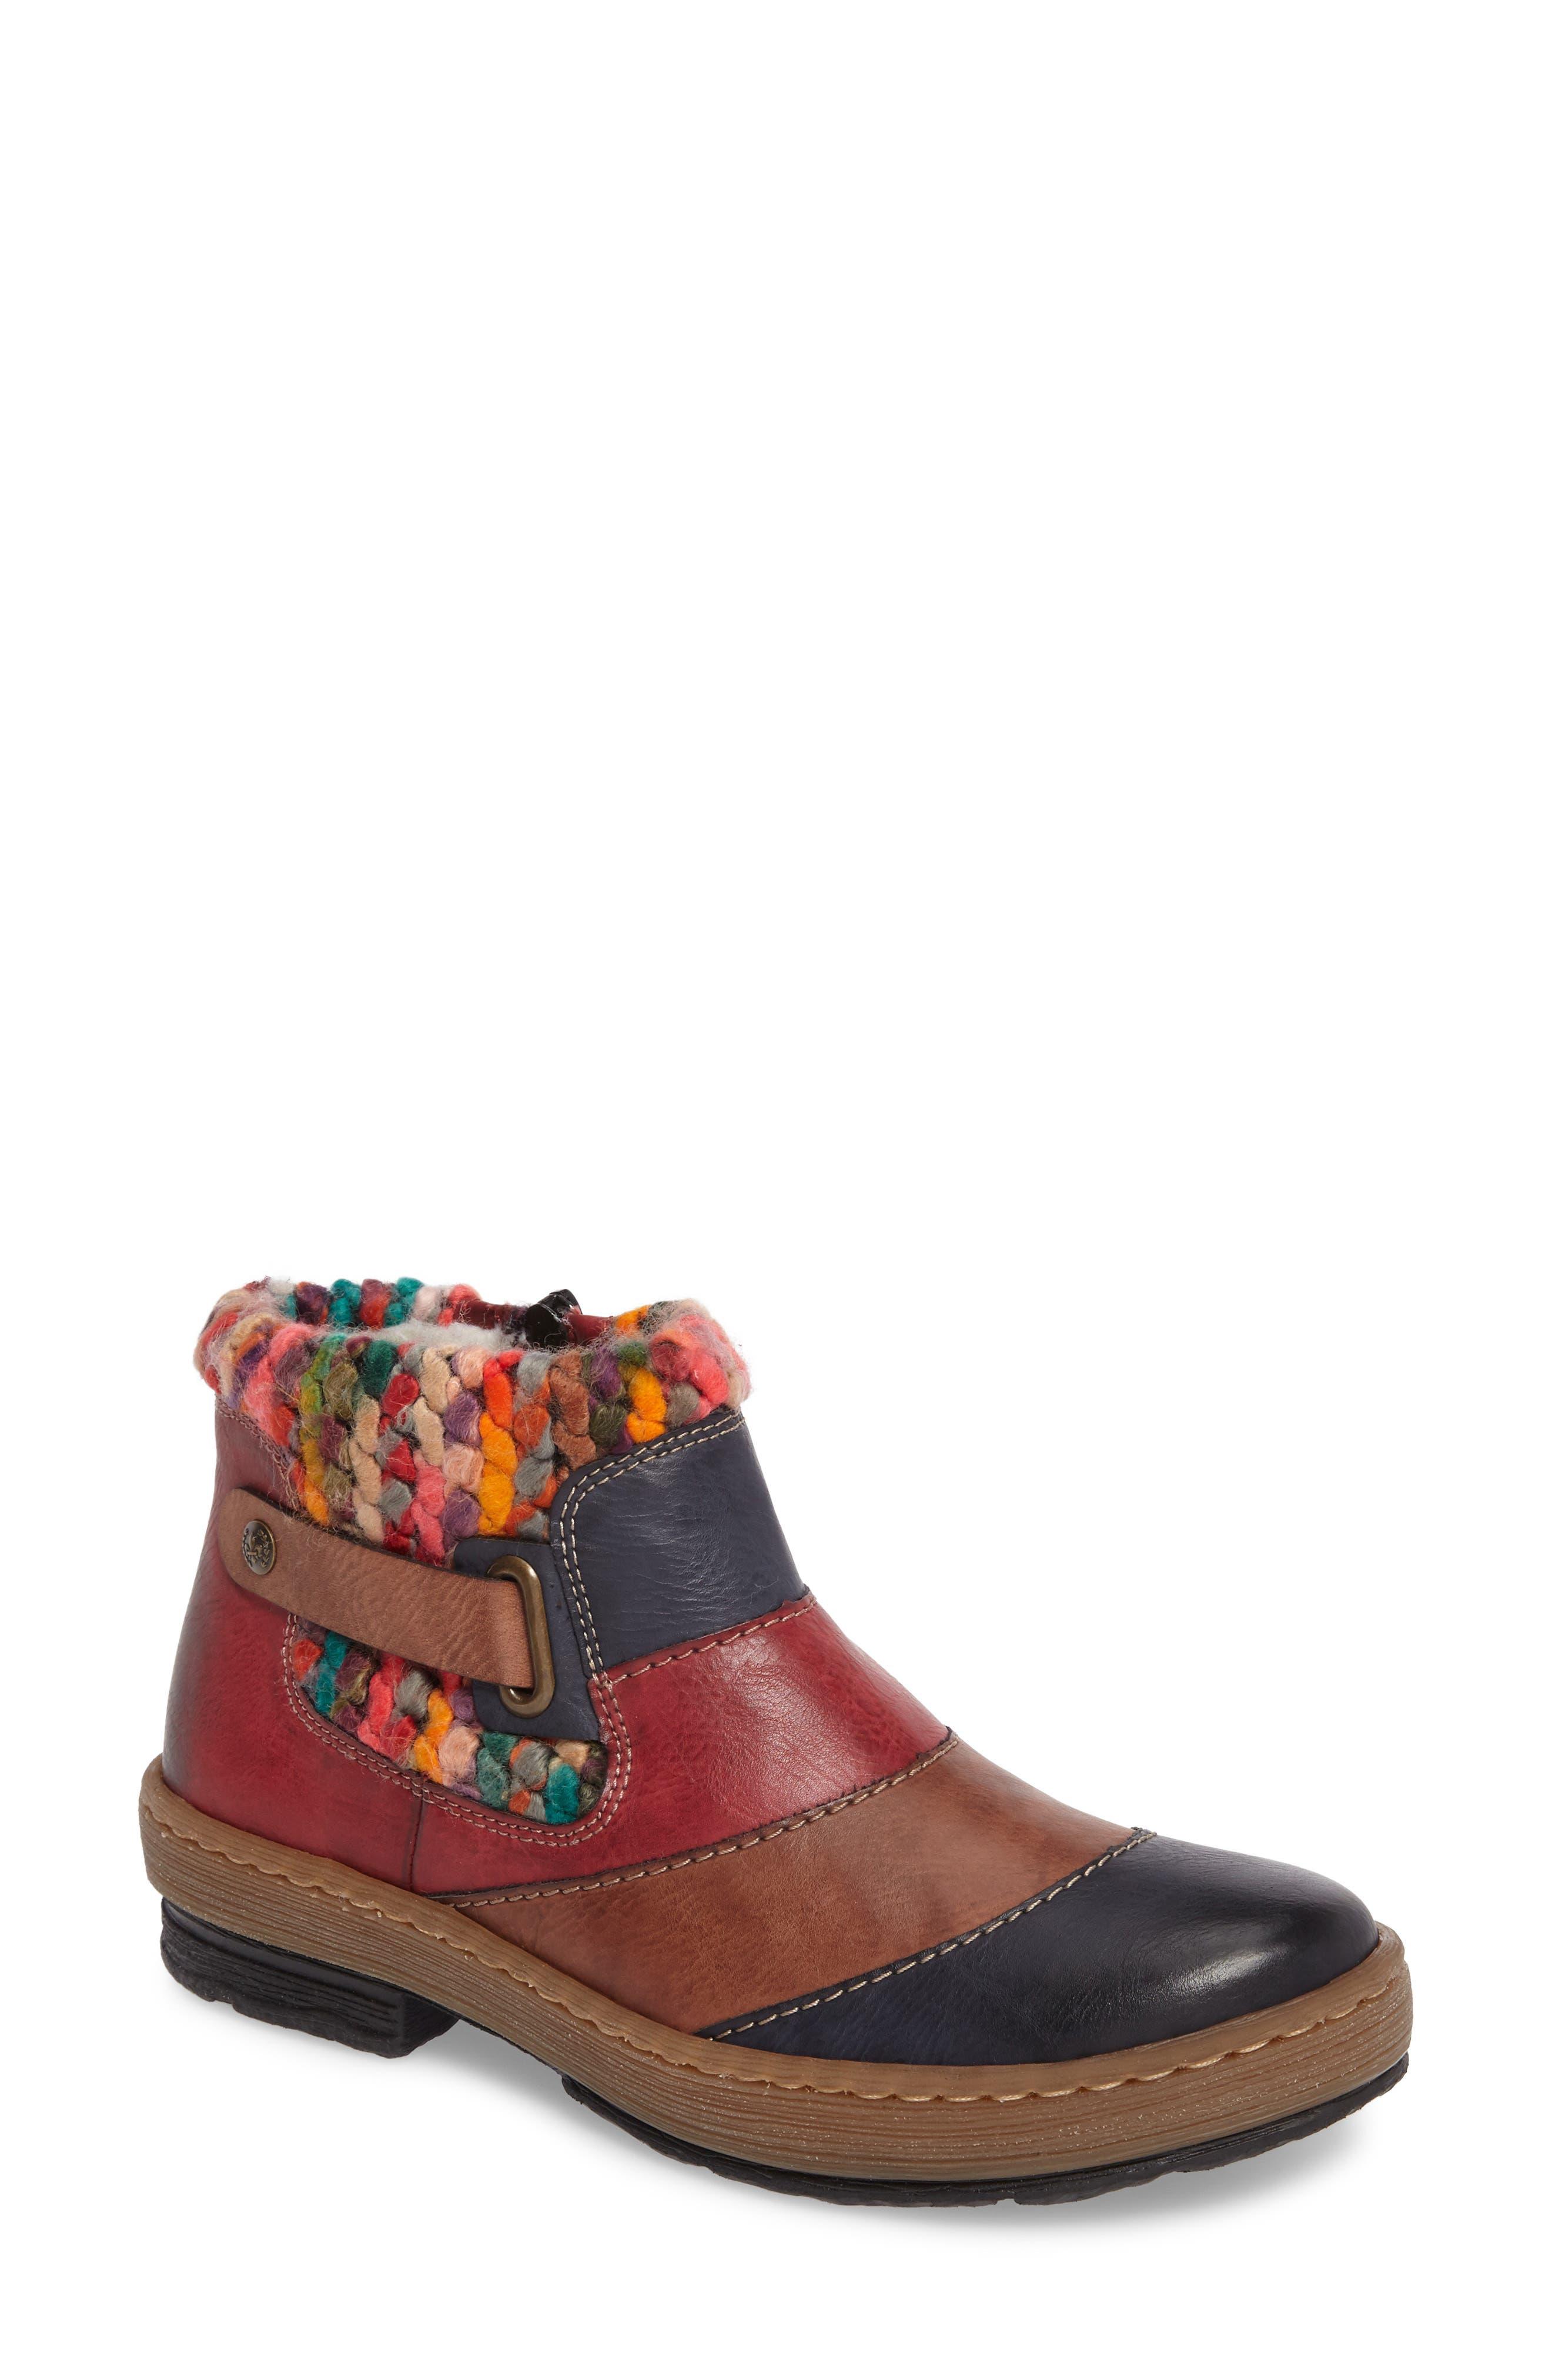 Felicitas 82 Boot,                         Main,                         color, Ocean Multi Faux Leather